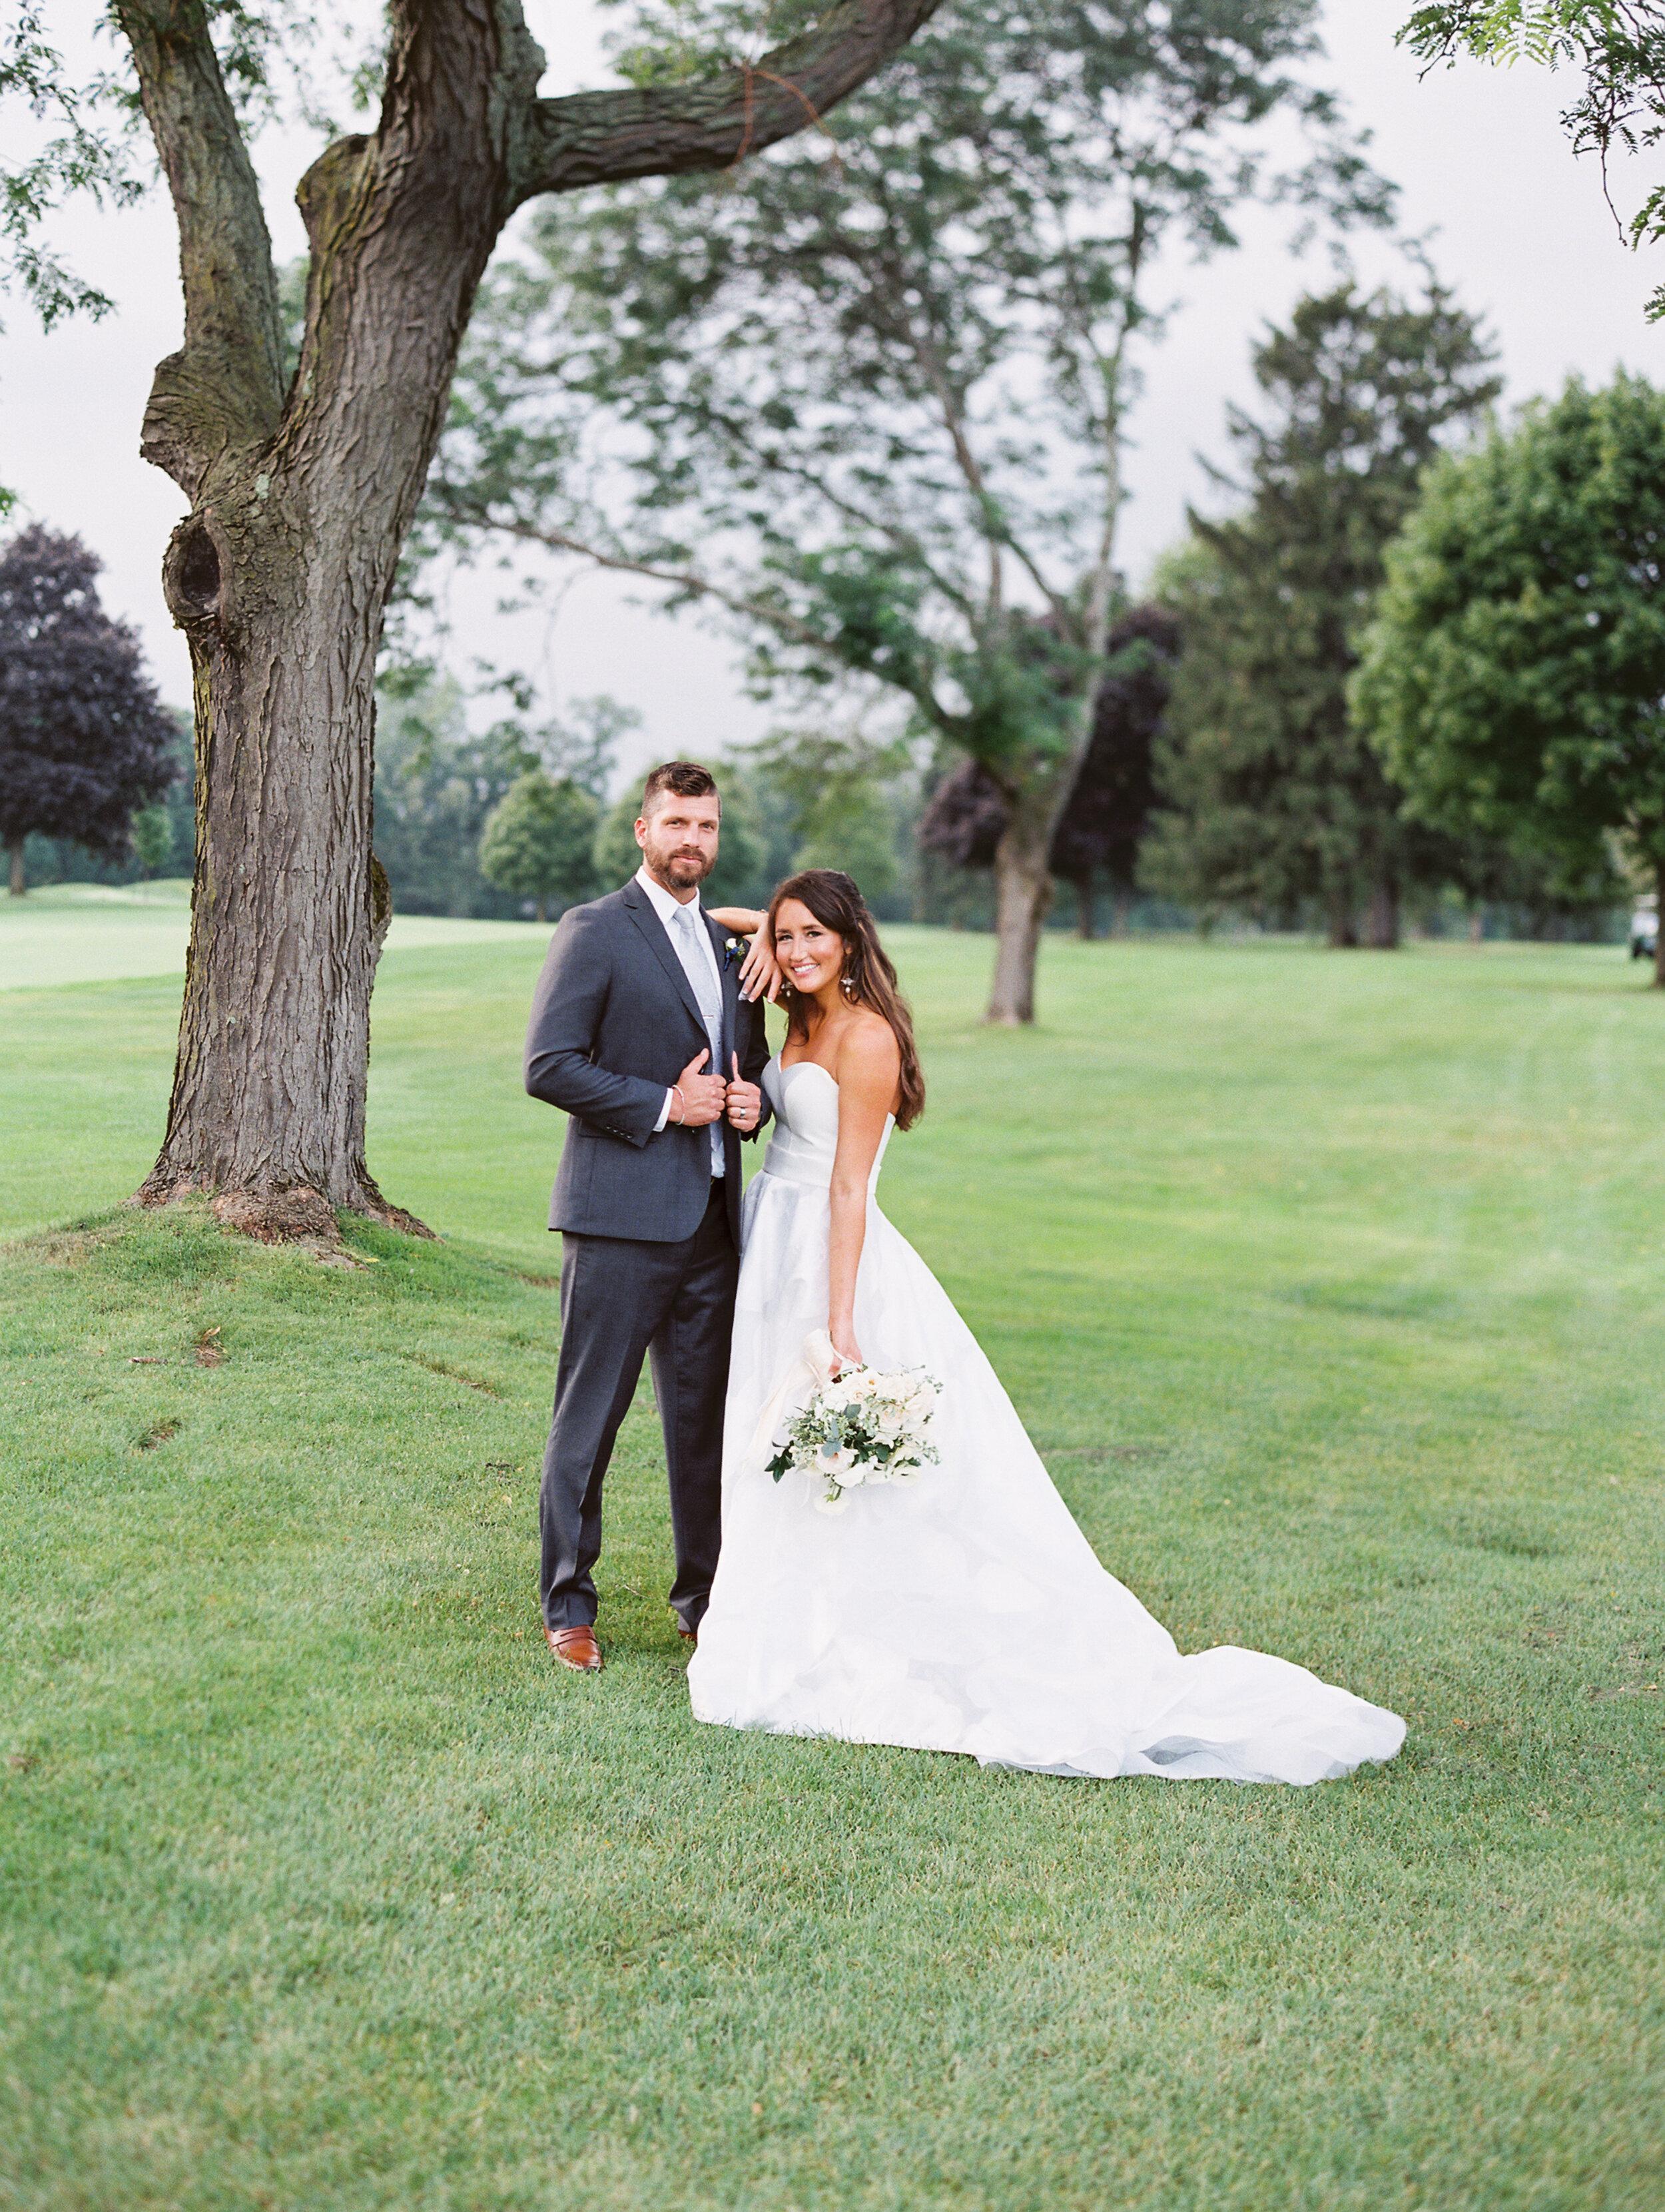 Kuiper+Wedding+Reception+Bridal+Party-160.jpg